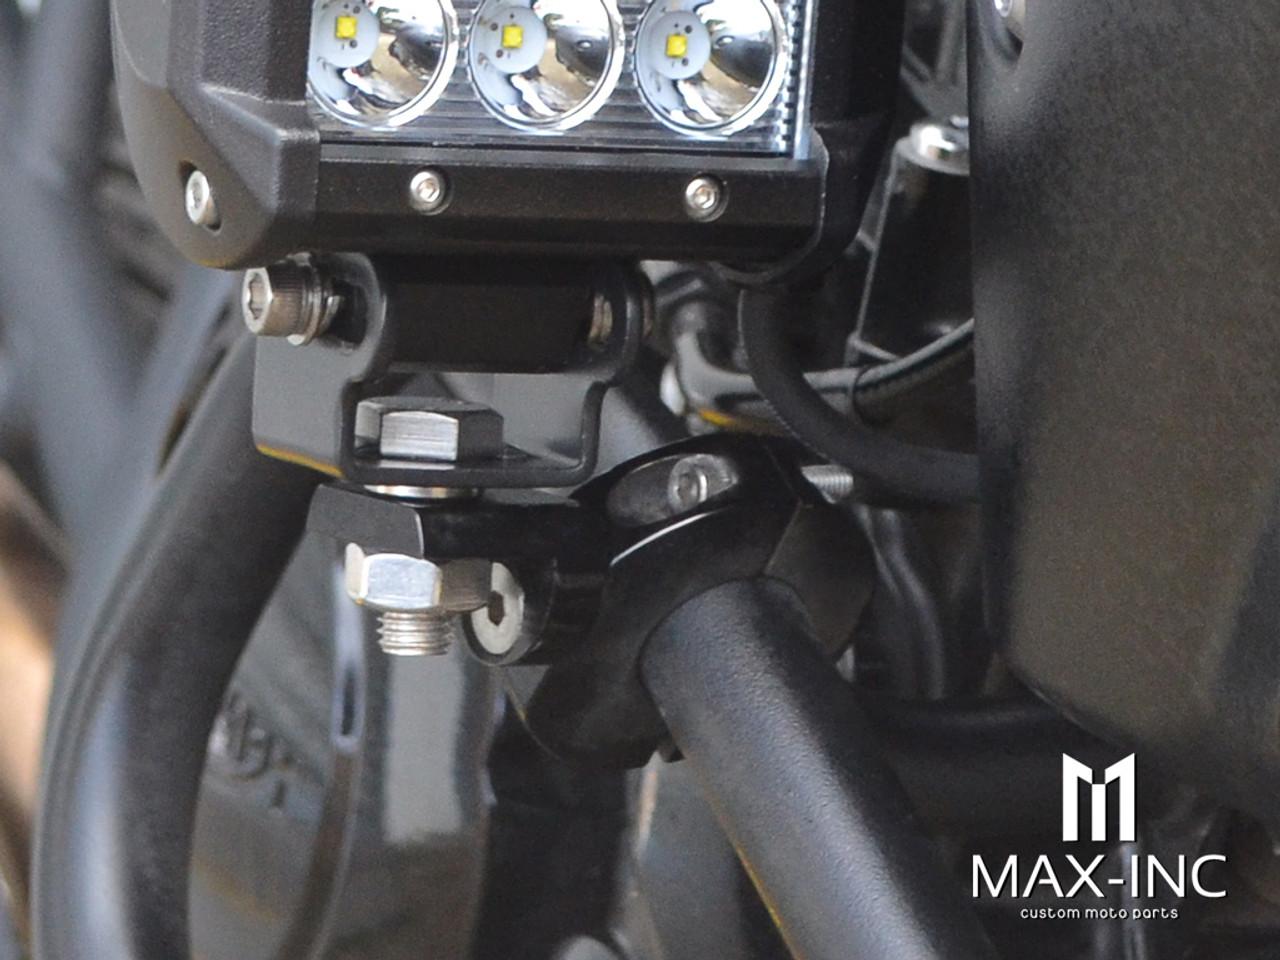 MAX High Quality CNC Machined Bar Mount Light Brackets - 28mm Diameter